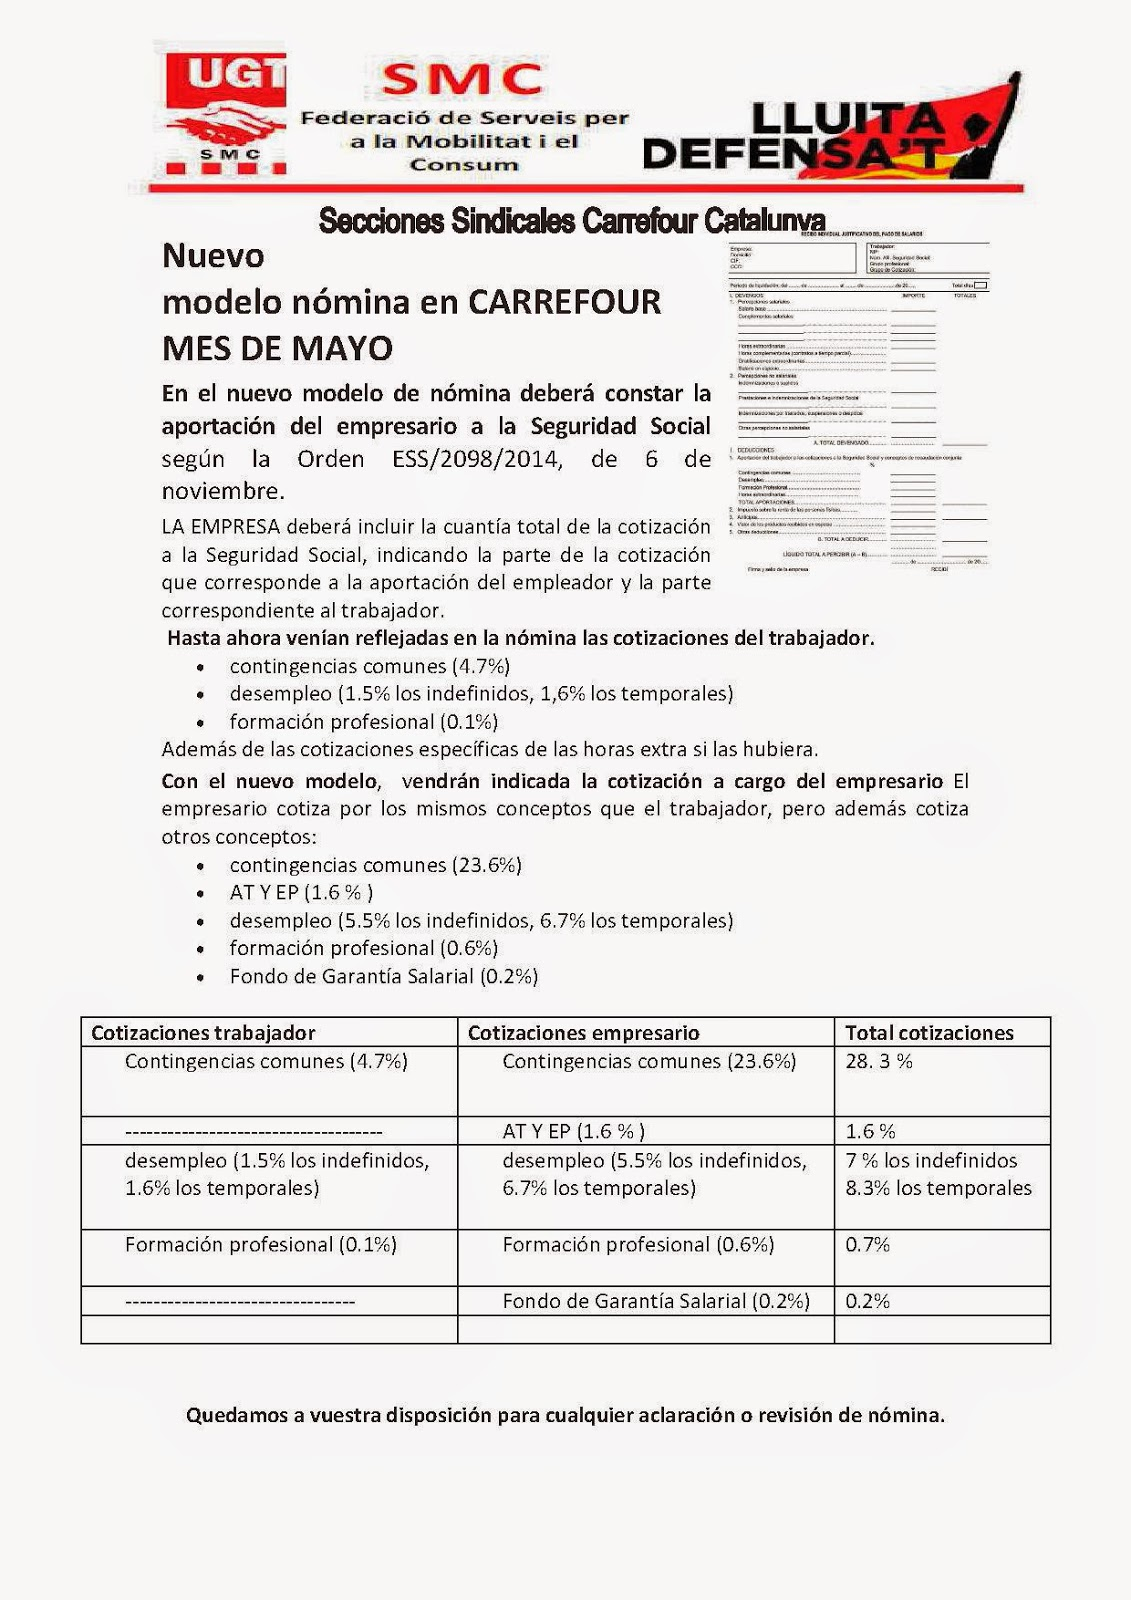 Carrefour cabrera ugt nuevo modelo hoja de nomina carrefour for Hoja nomina